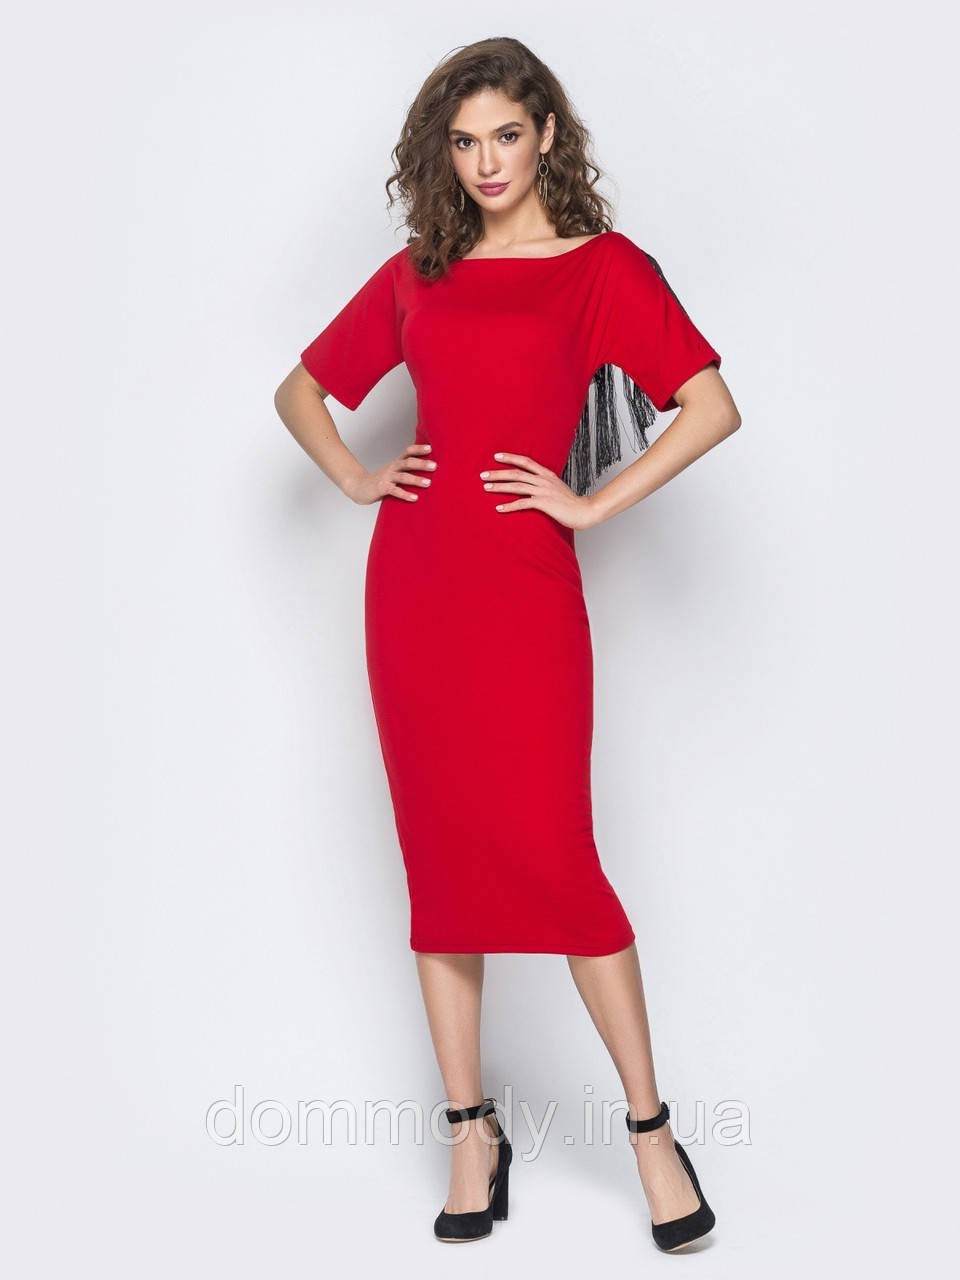 Платье женское Sophie red